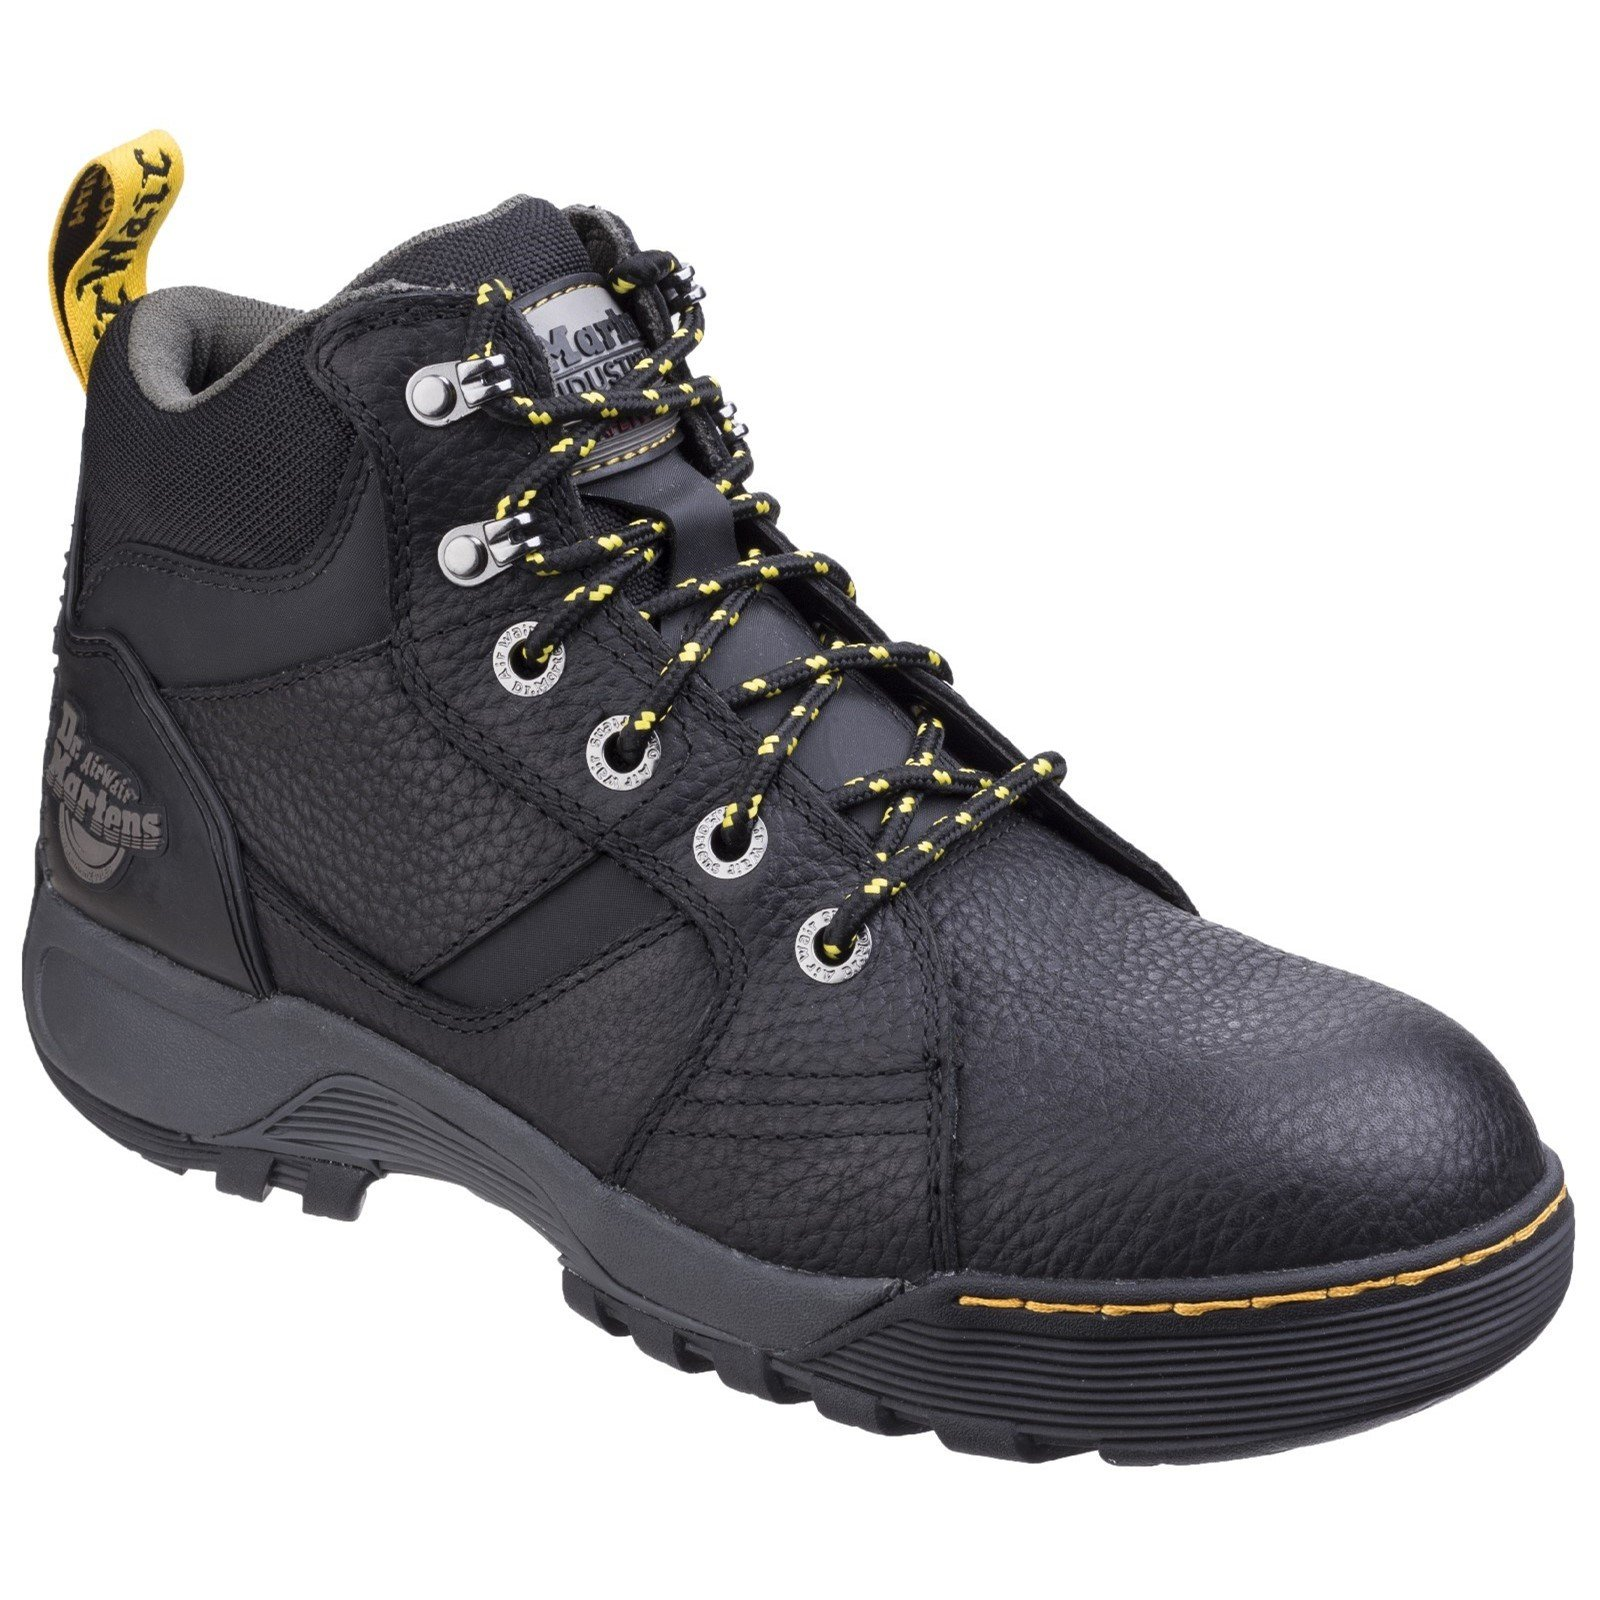 Dr Martens Men's Grapple Safety Boot Various Colours 26023 - Black 6